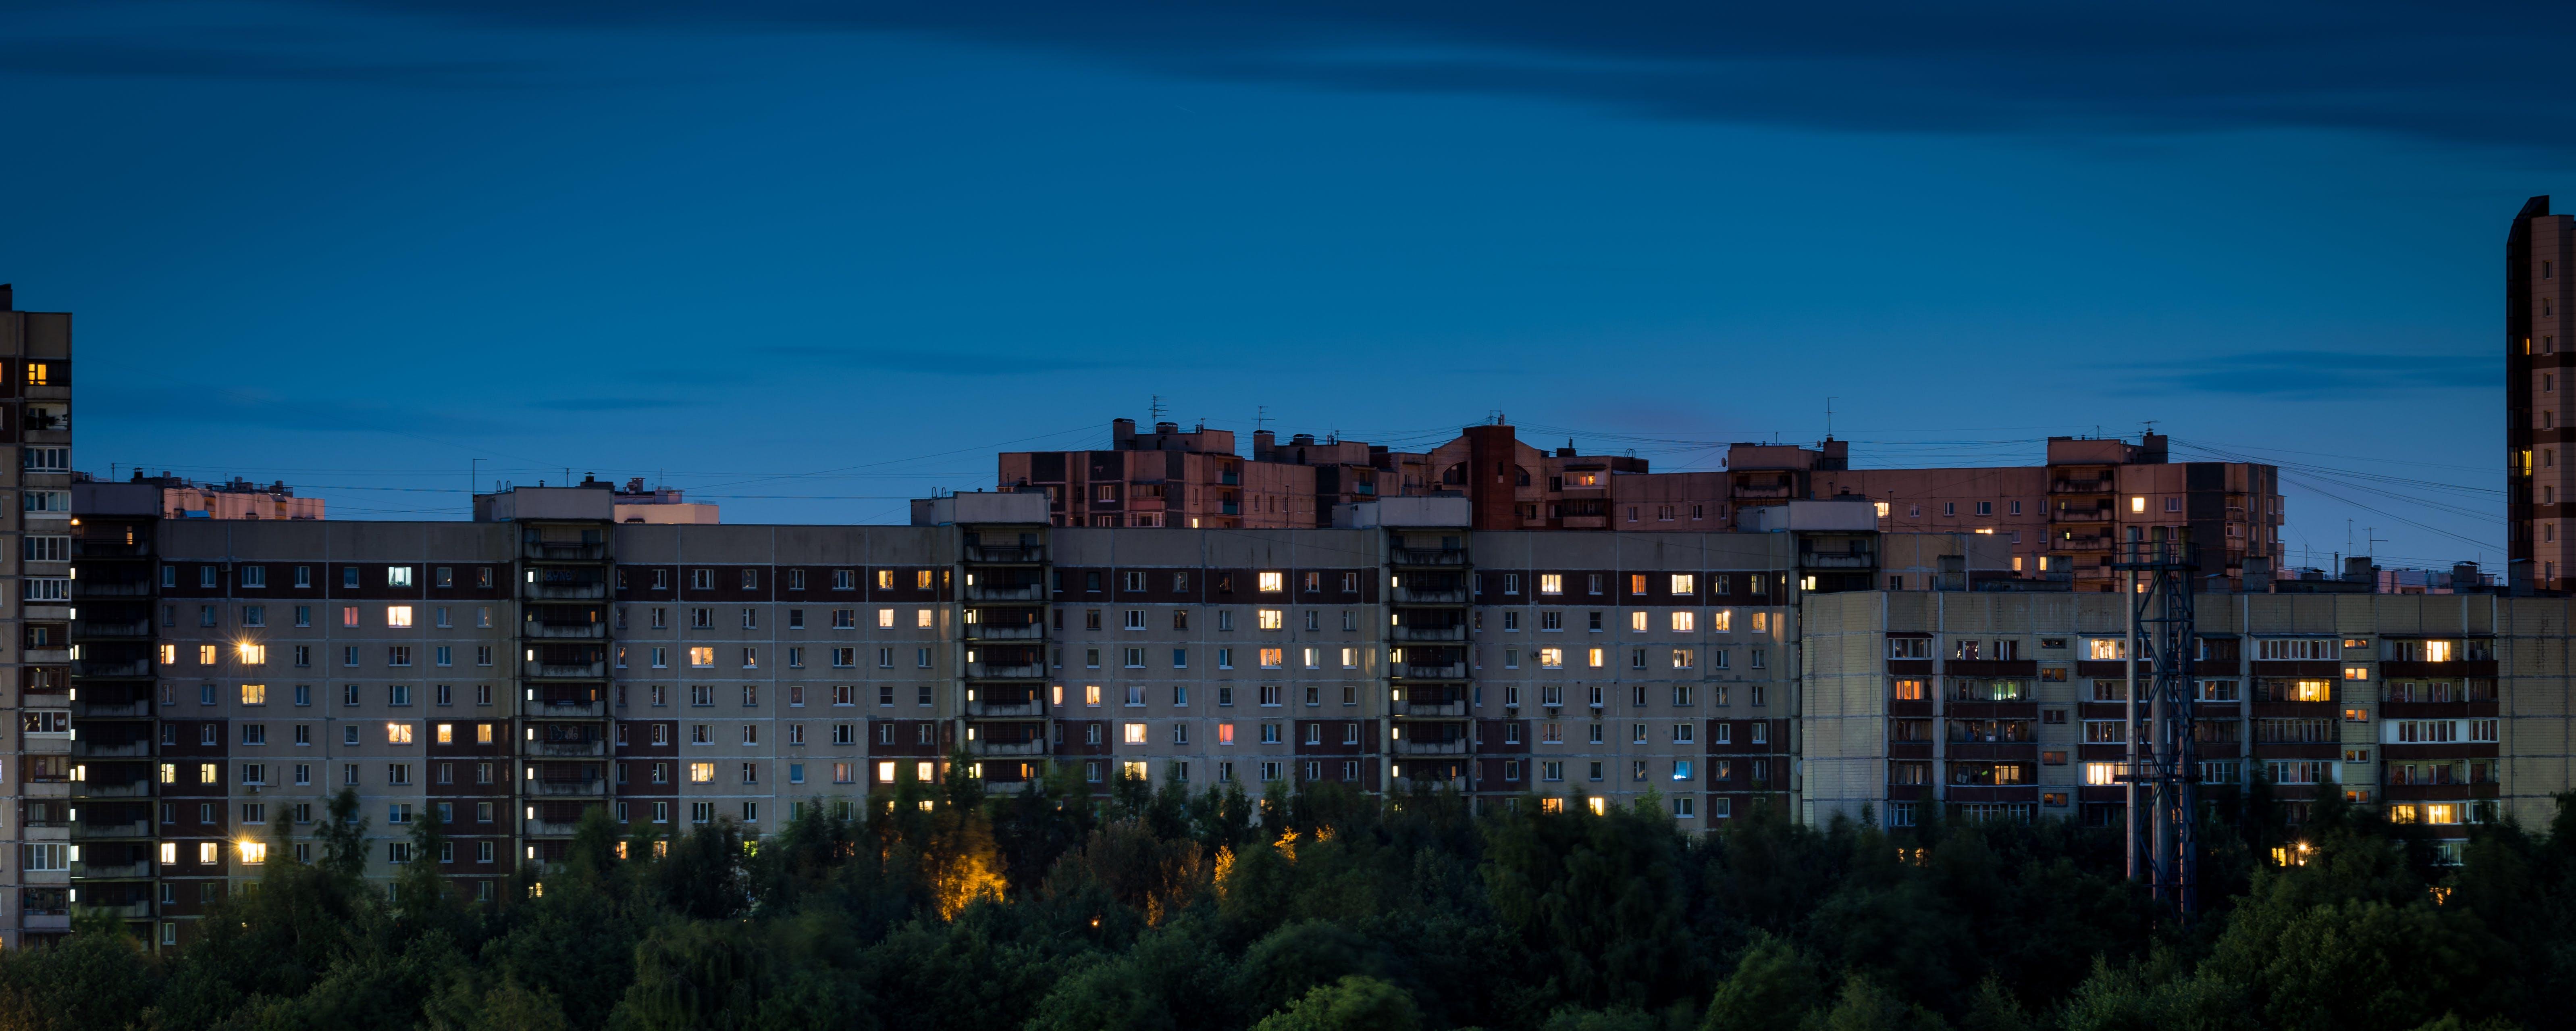 Free stock photo of evening, houses, landscape, windows